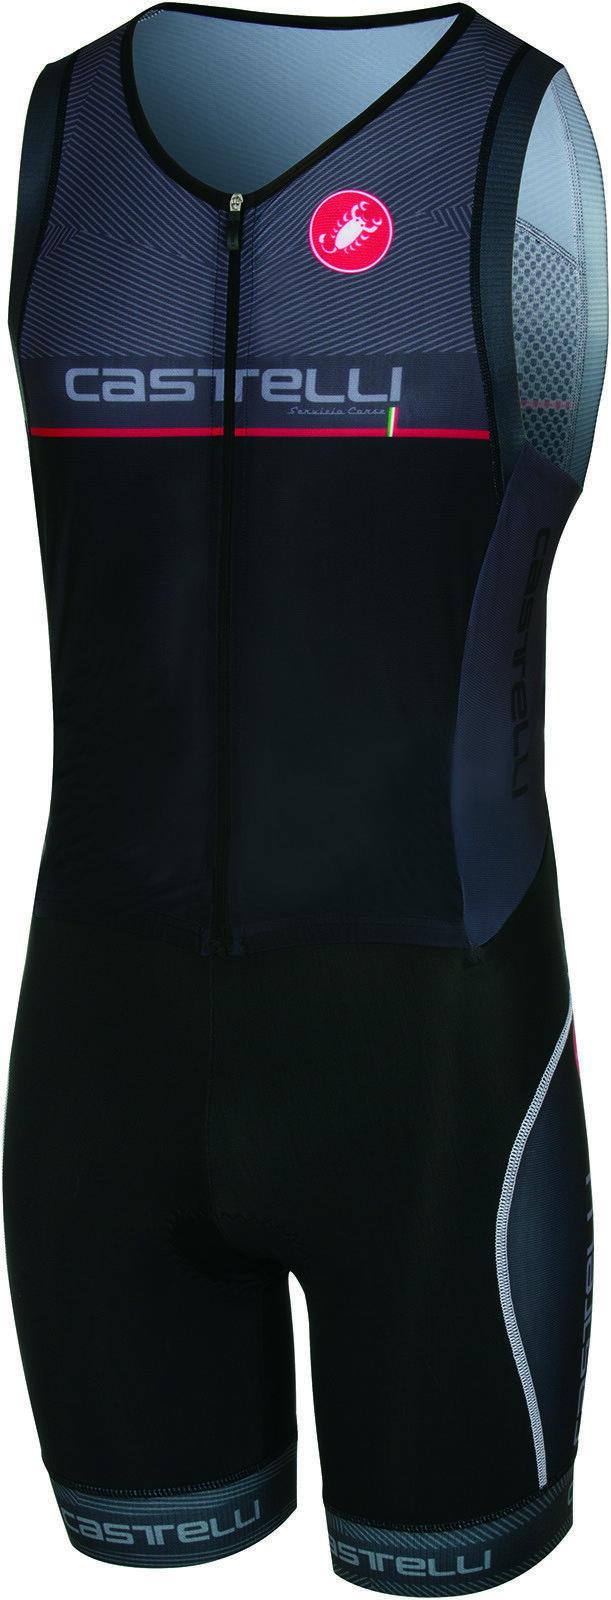 New Castelli Free Sanremo Suit SL / Skin Suit / Triathlon - Various Größes